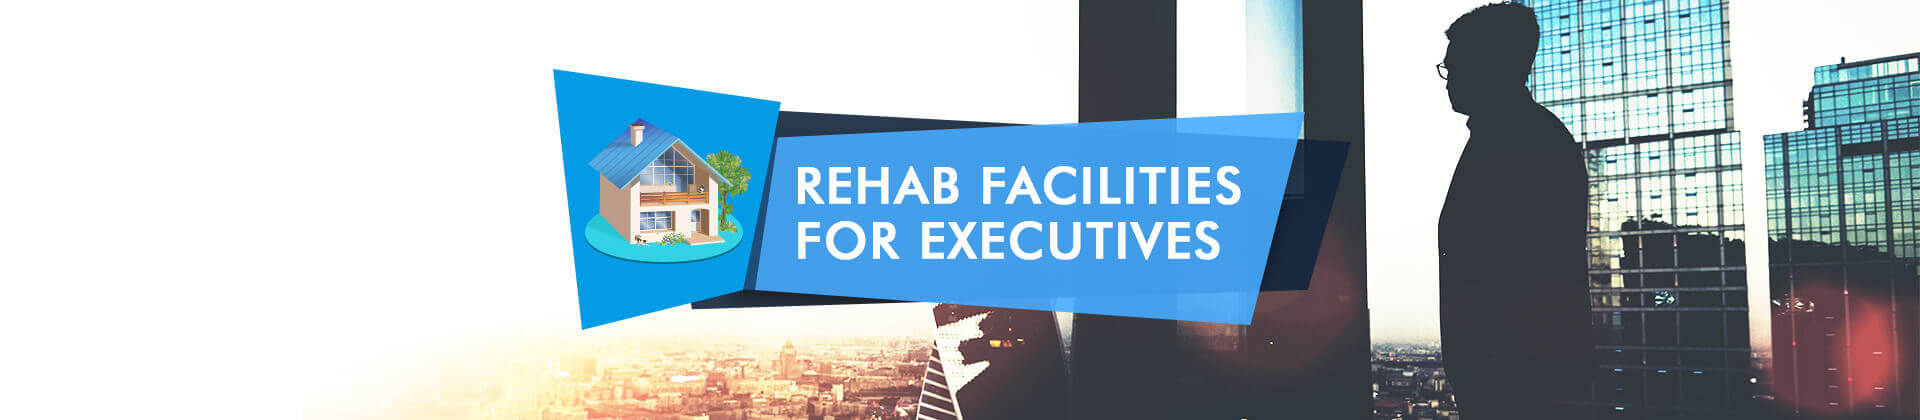 rehabilitation for executives